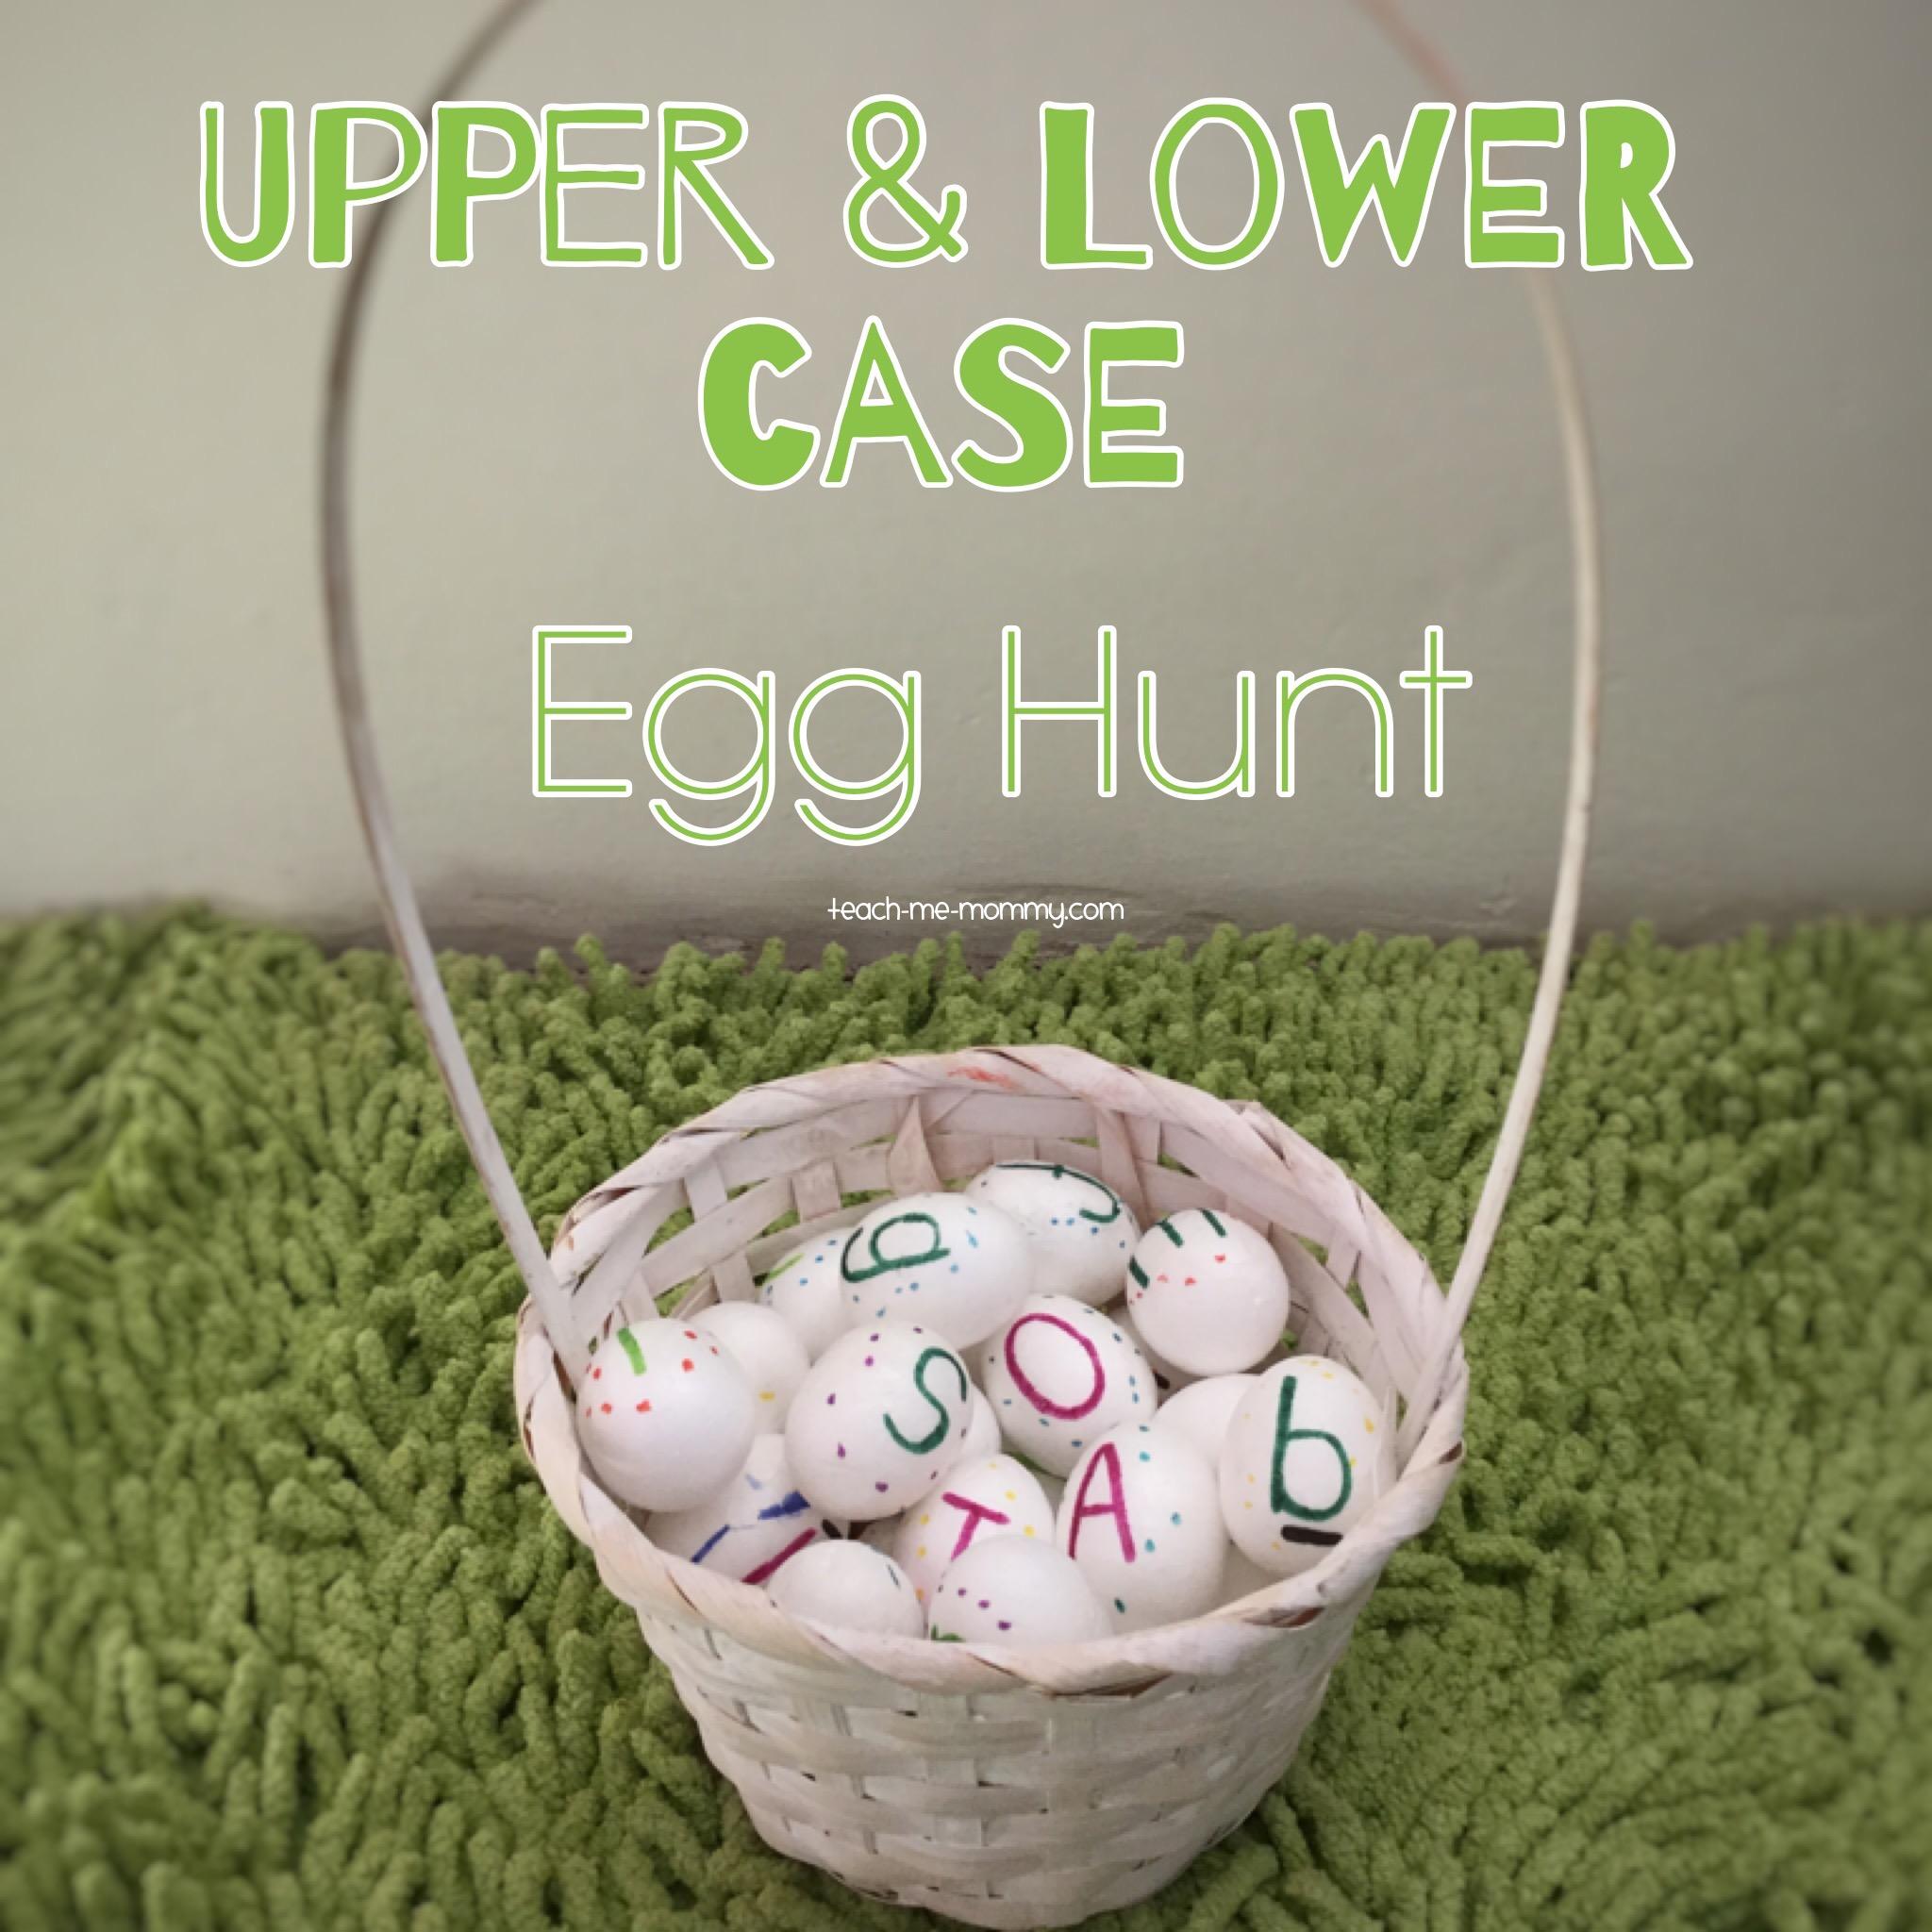 Upper and lower case egg hunt